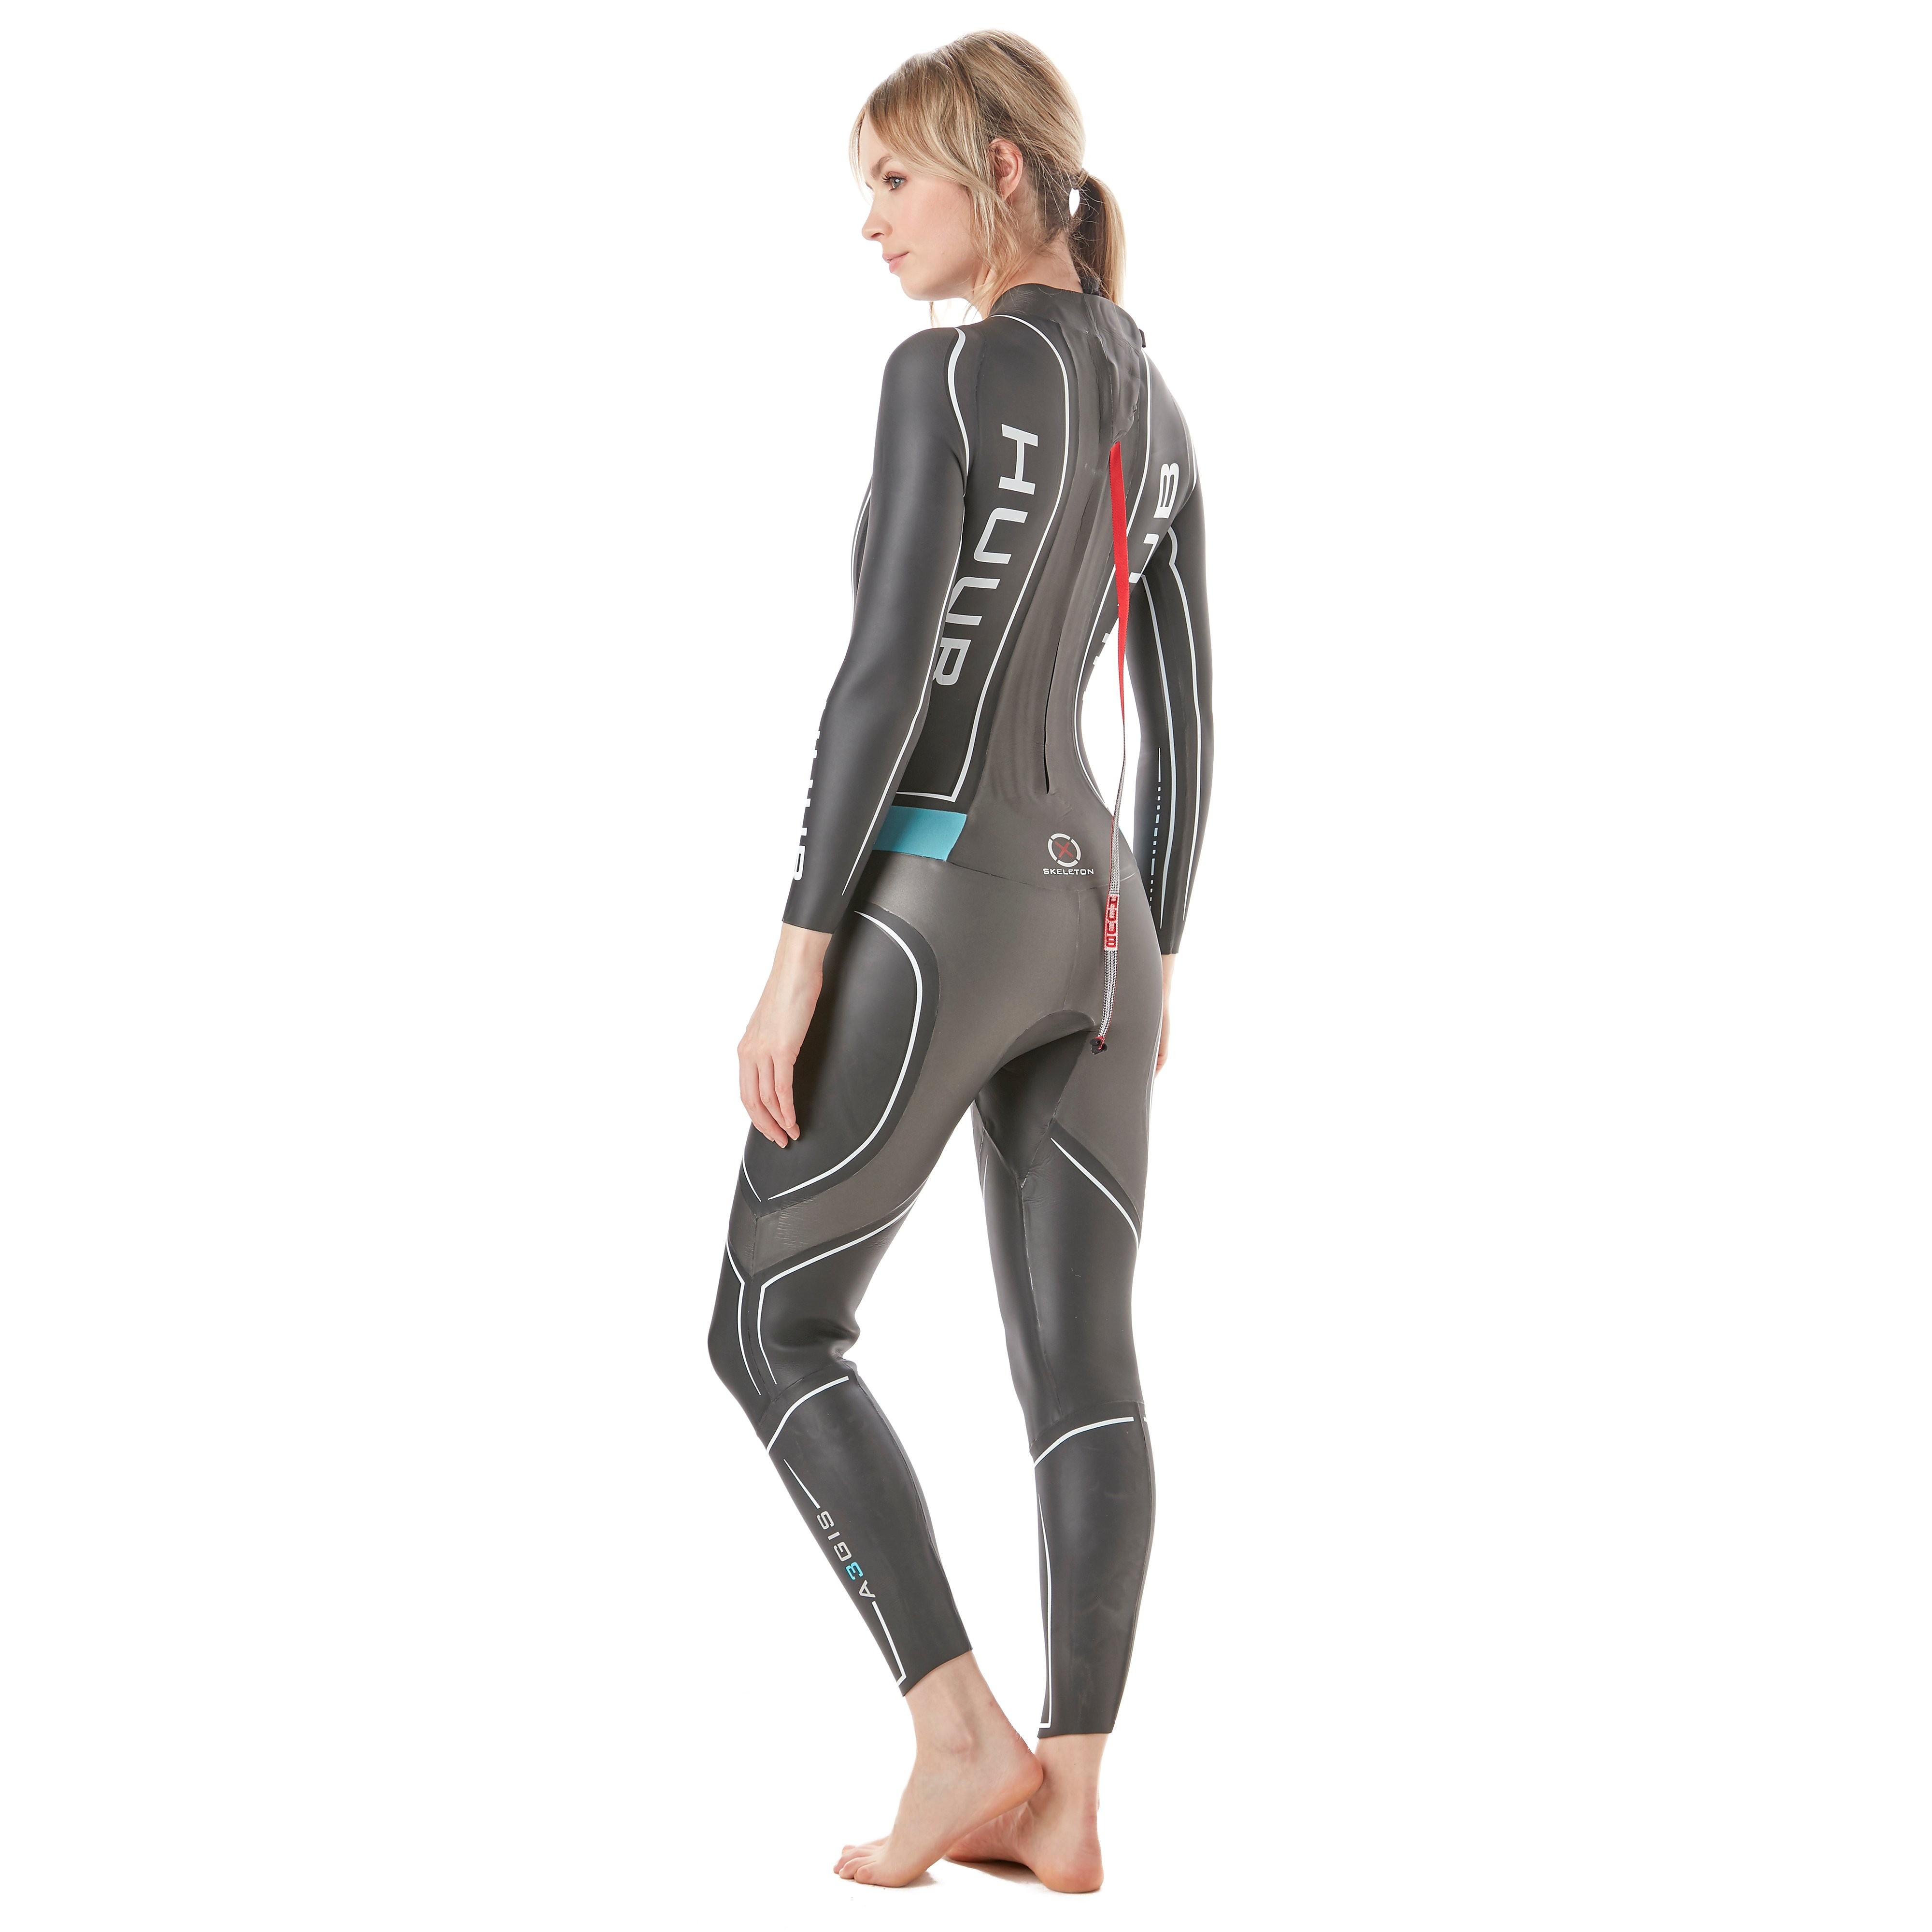 Huub AEGIS III 3:3 Women's Triathlon Wetsuit